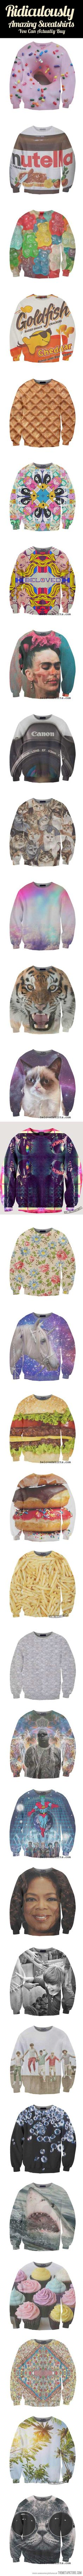 Ridiculously Amazing Sweatshirts… I want them all